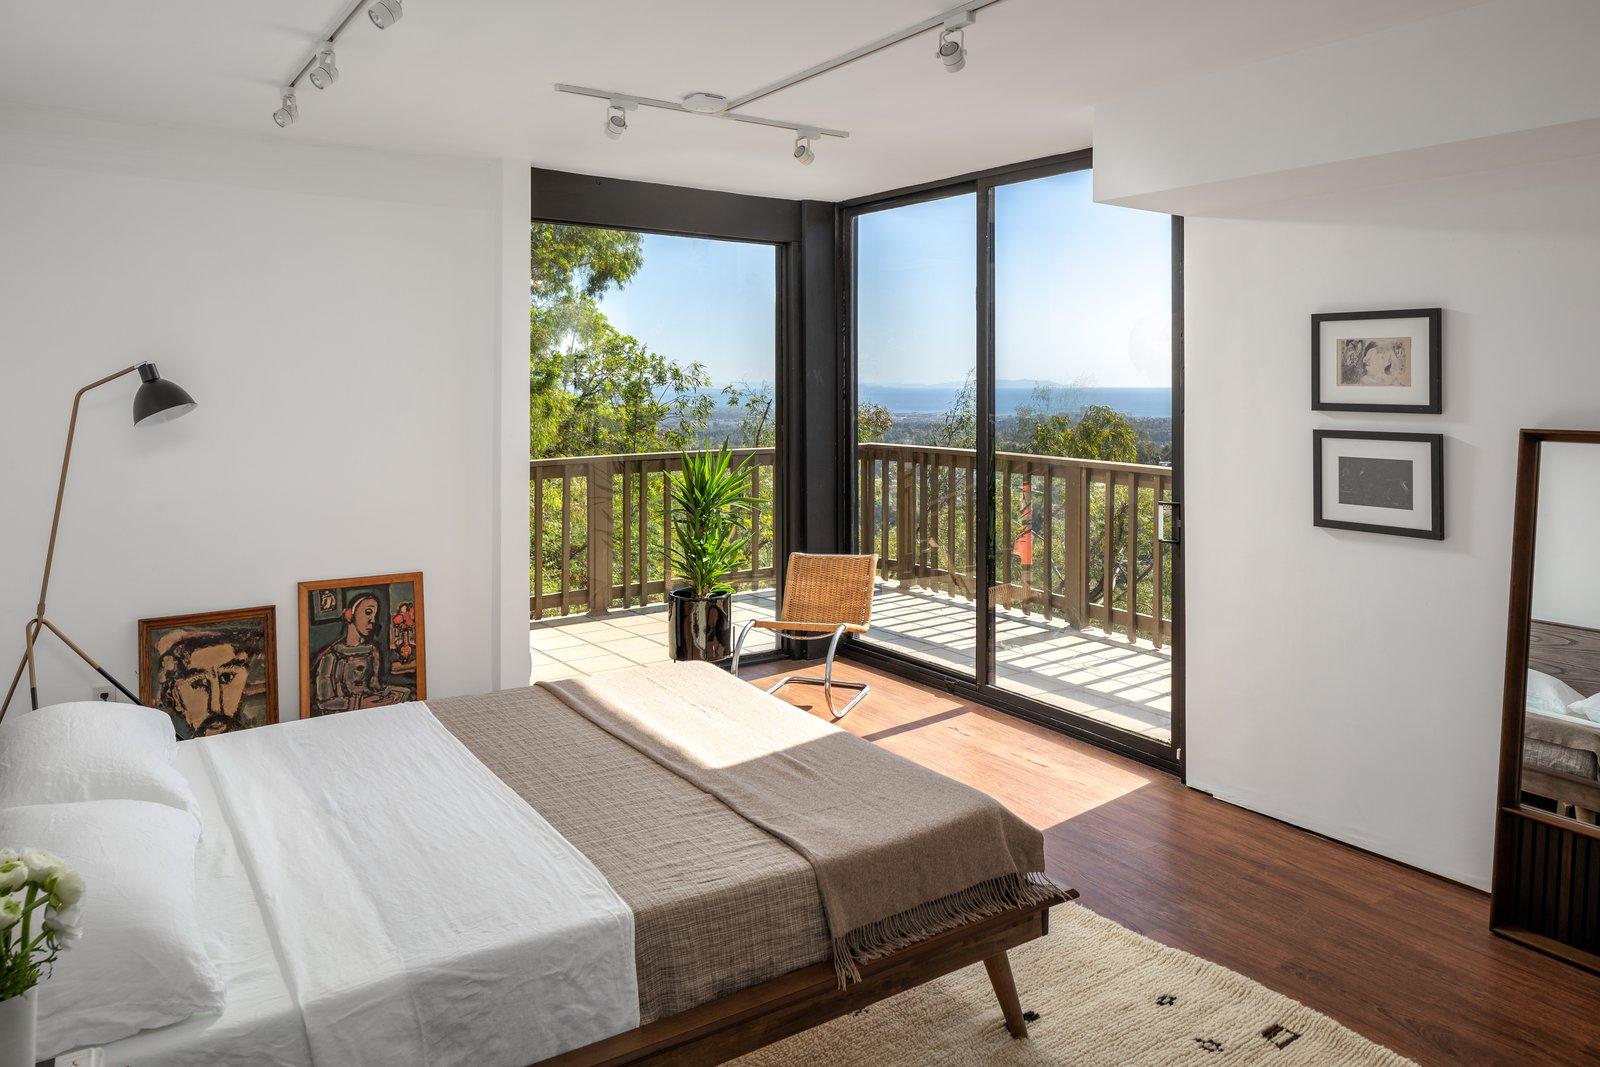 Franks House bedroom